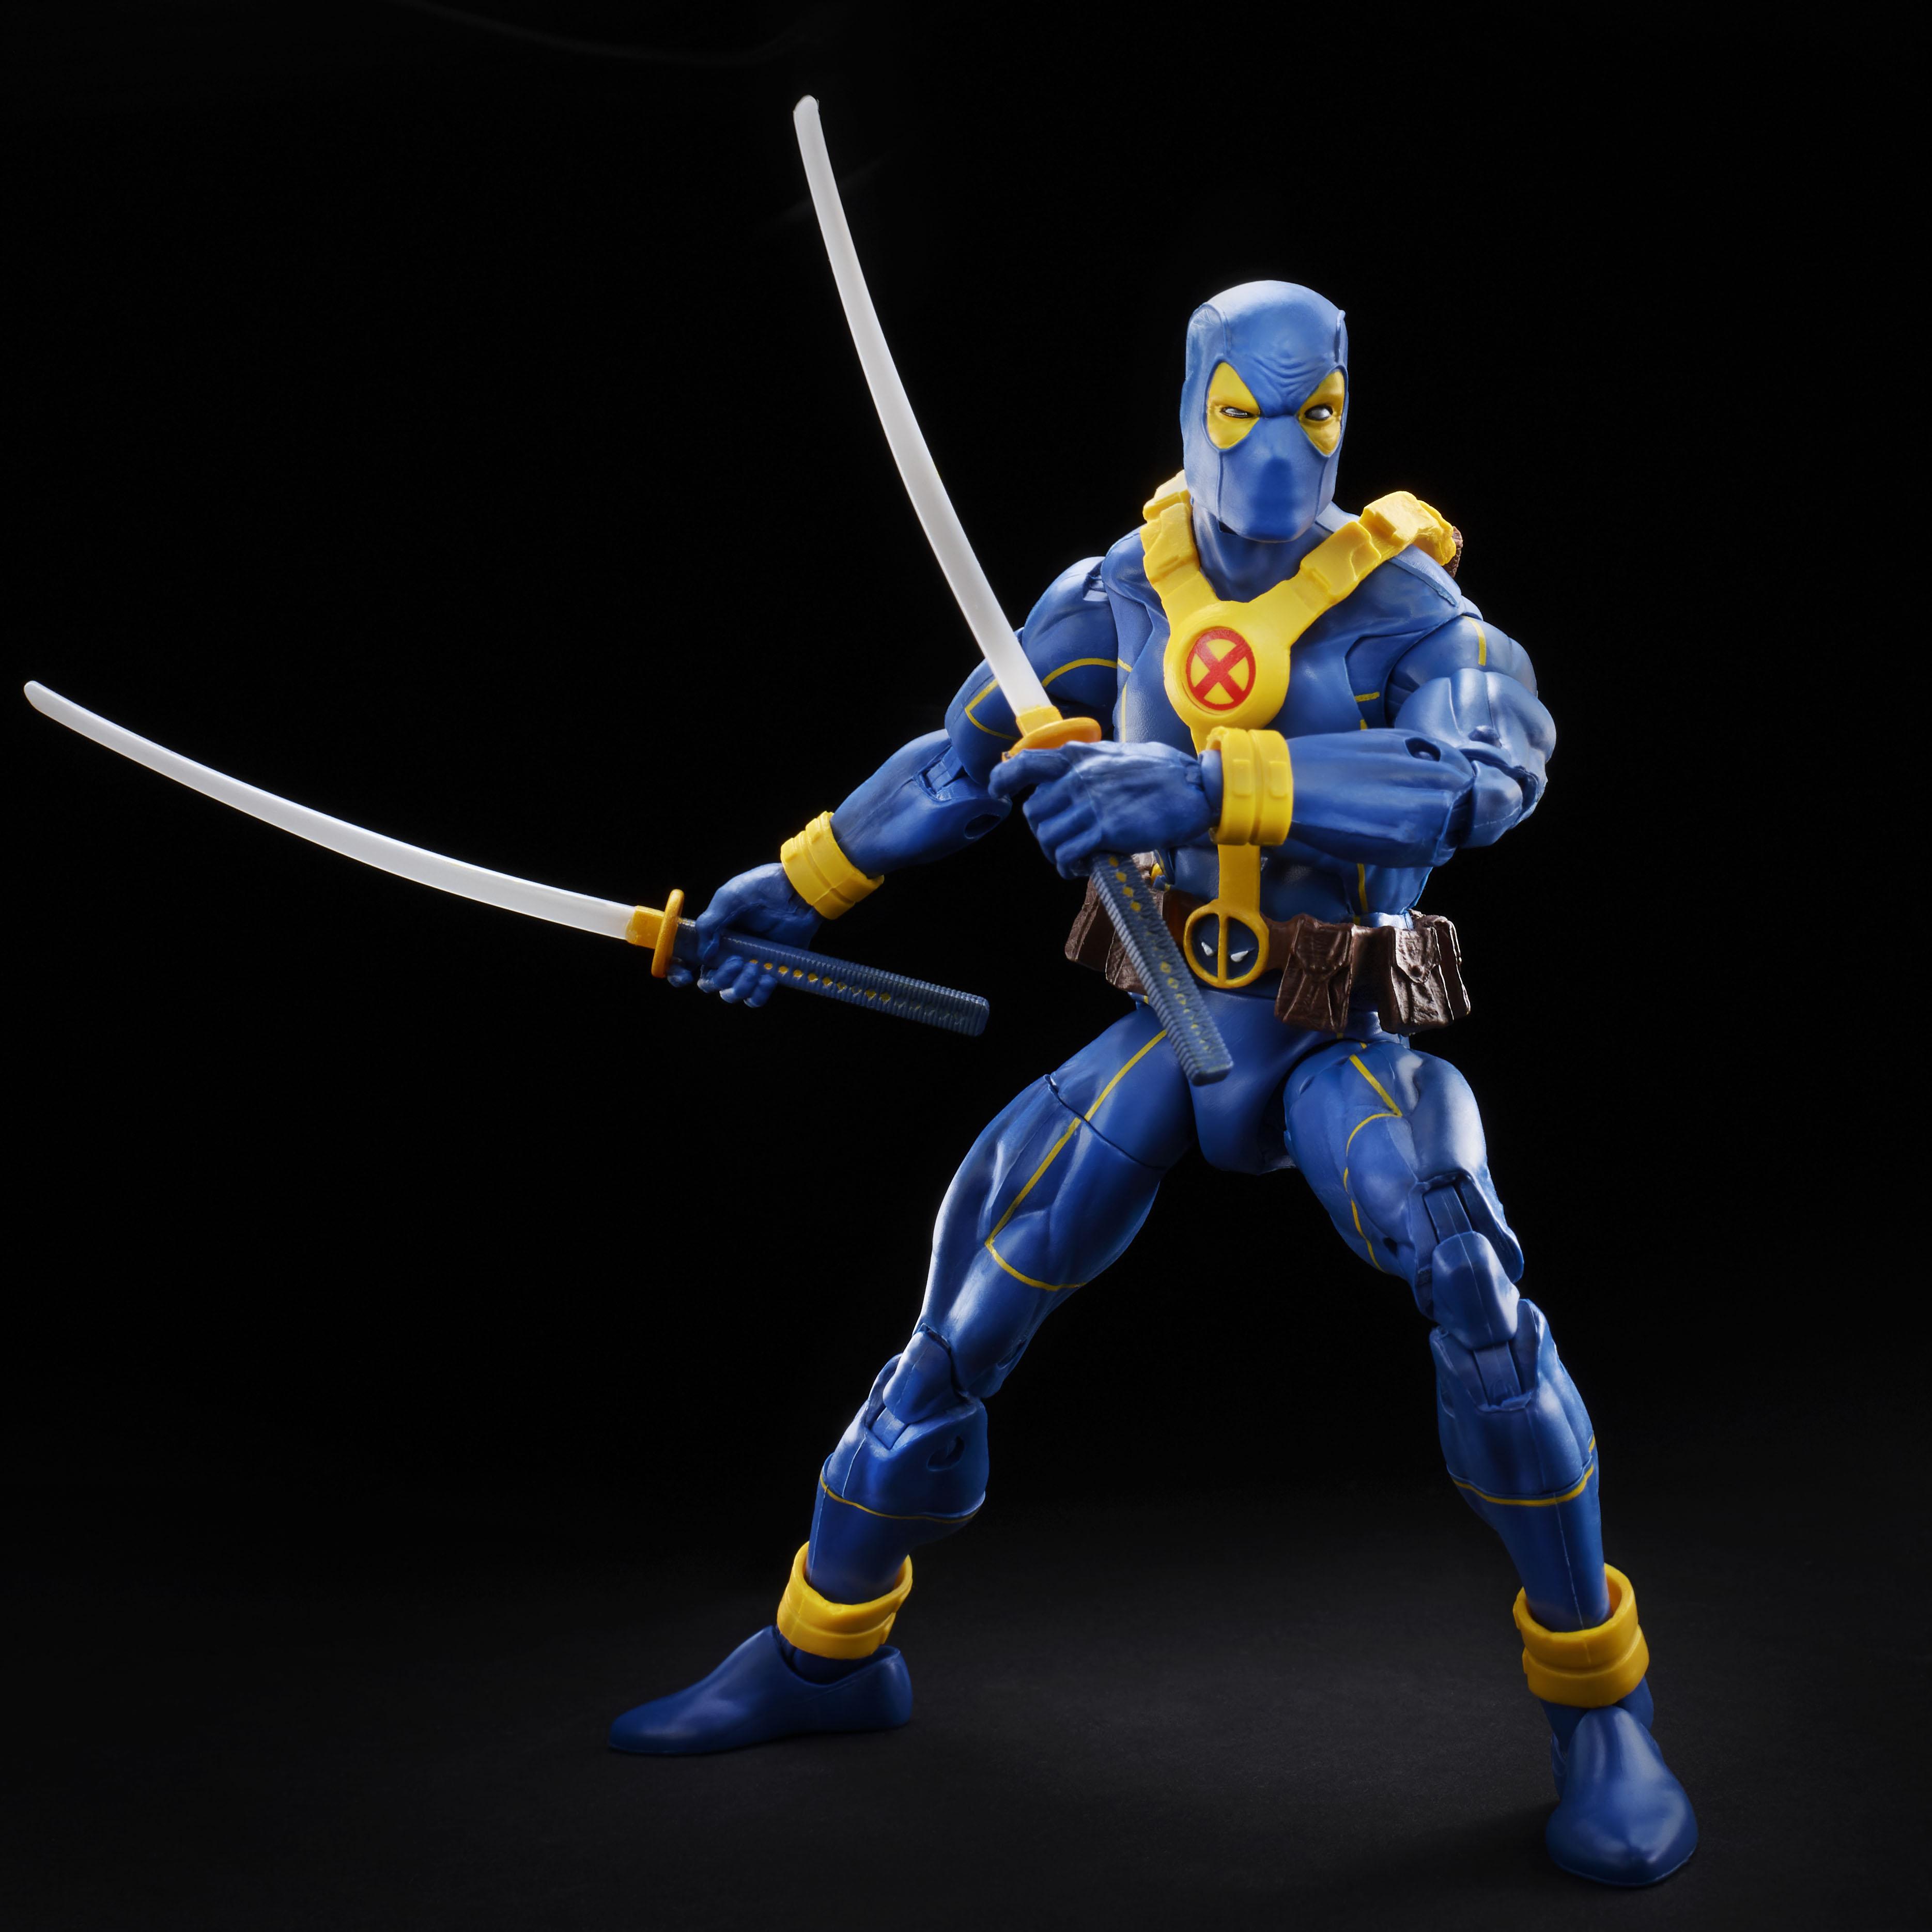 E7456_prod_mvl_legends_deadpool_AST_Blue_Yellow_Deadpool